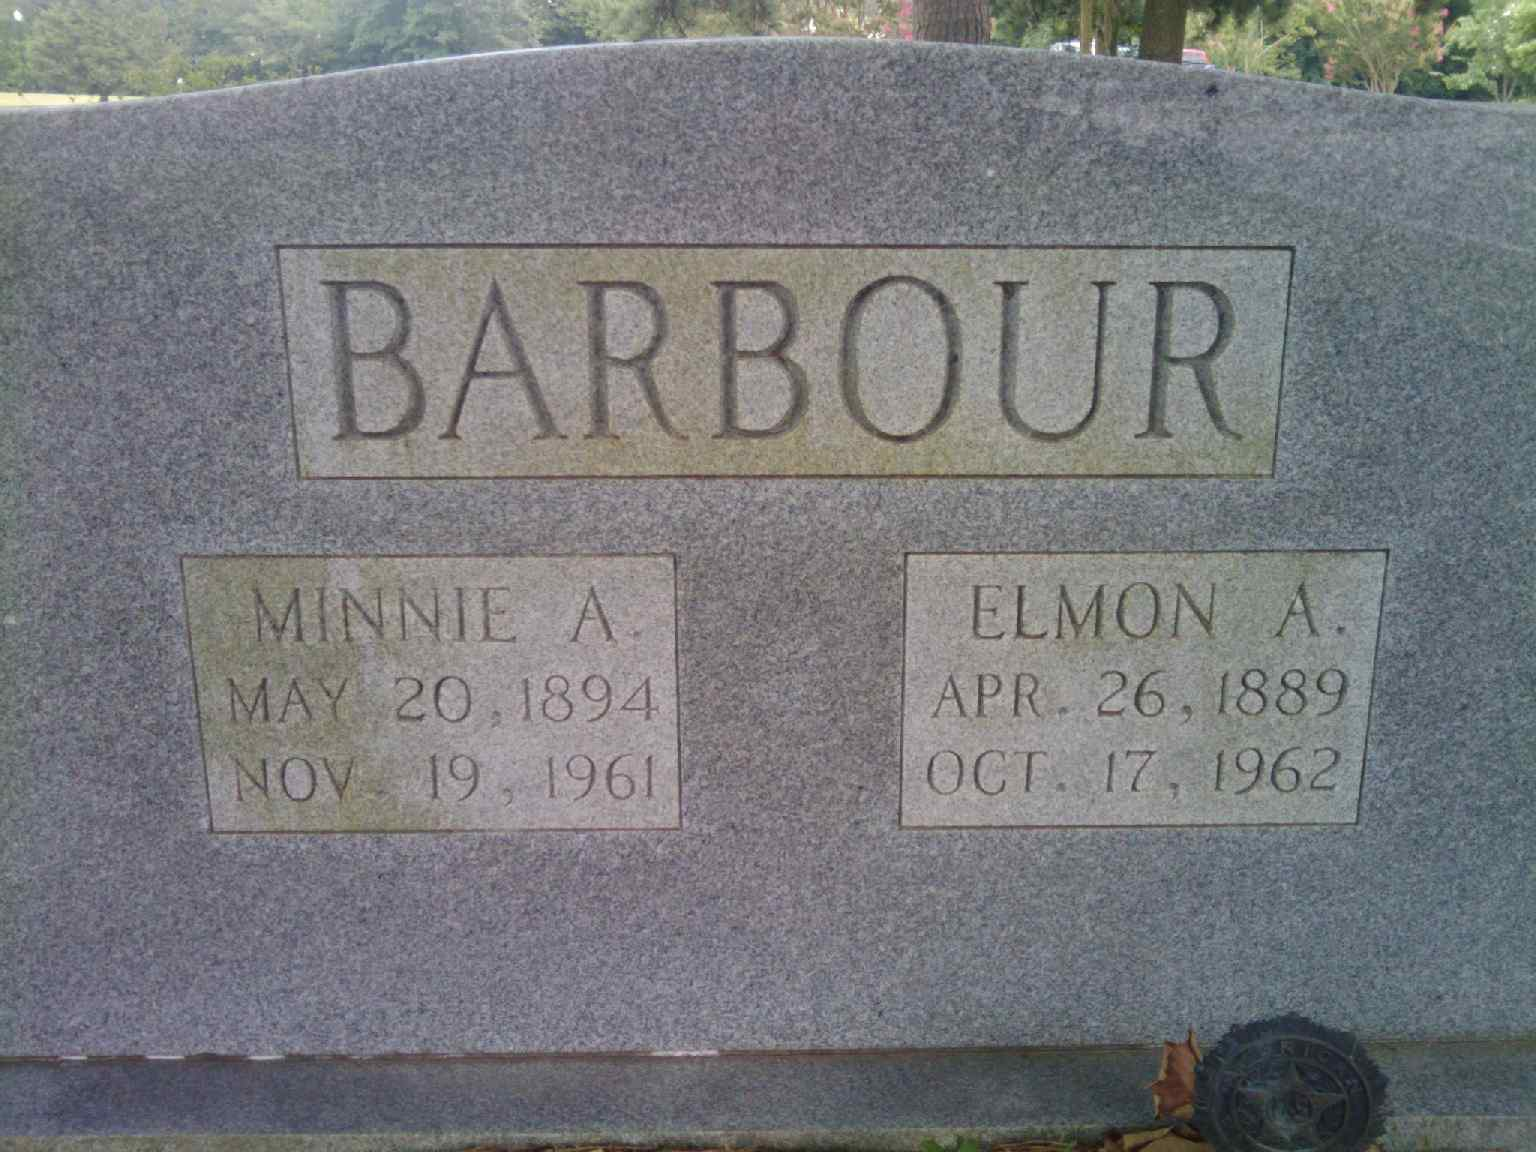 Minnie A. Barbour